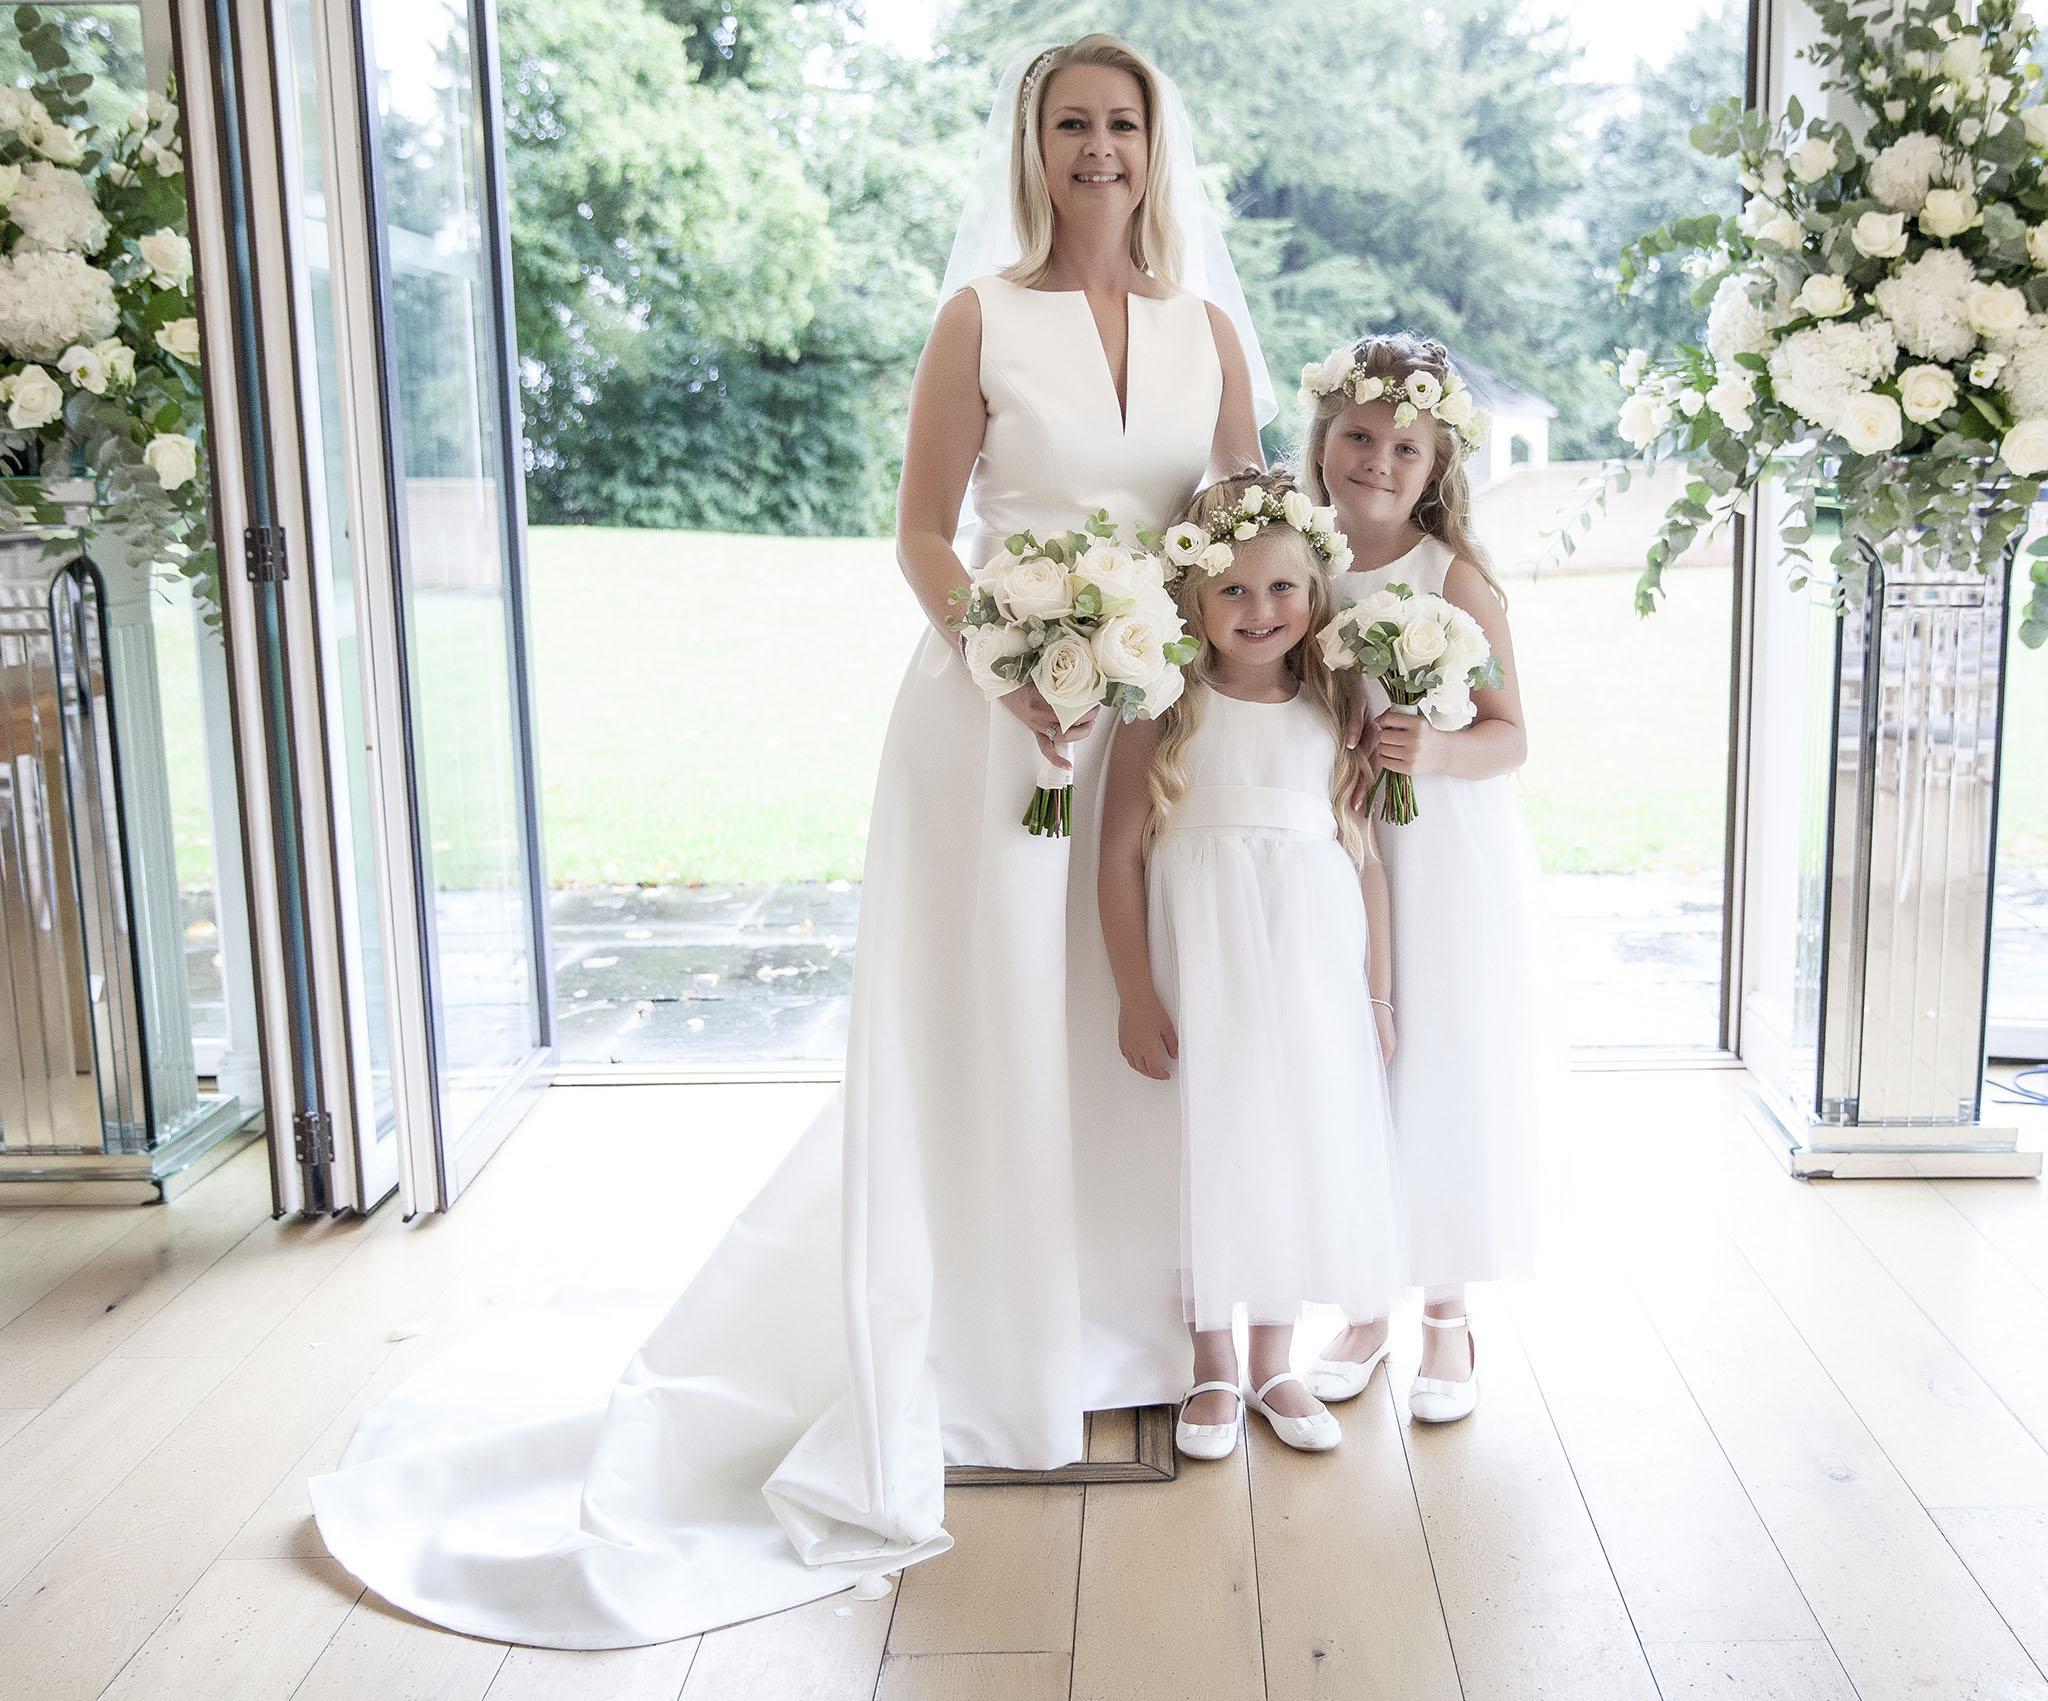 elizabethg_photography_hertfordshire_fineart_photographer_tonycharlie_wedding_photography_aldermaston_wasing_park_reading_33.jpg